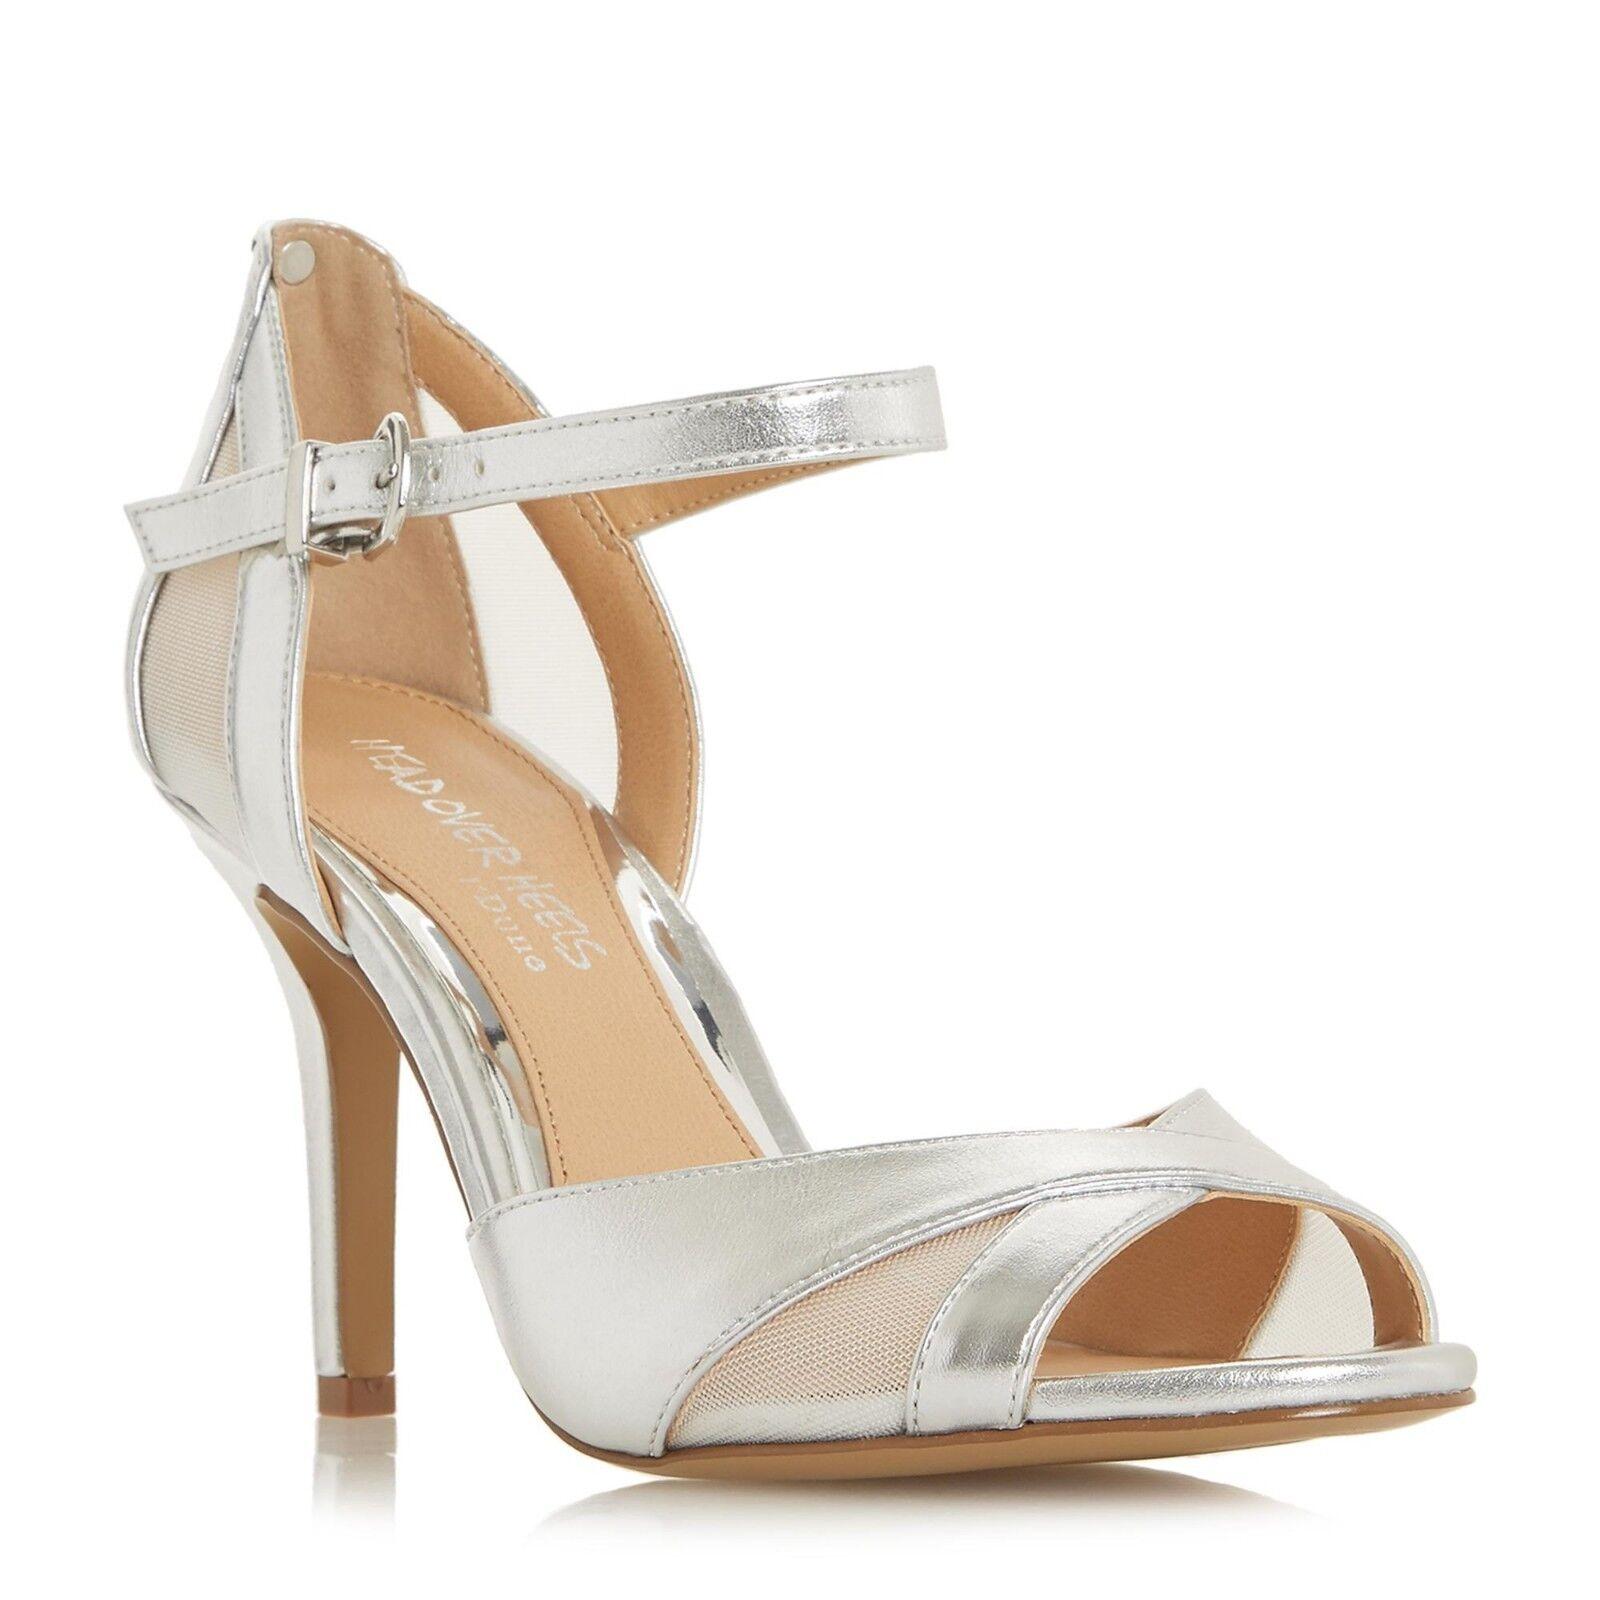 BNIB Dune Silver High Slim Heel Smart Evening Sandals Peep Toe Party shoes Sz 3